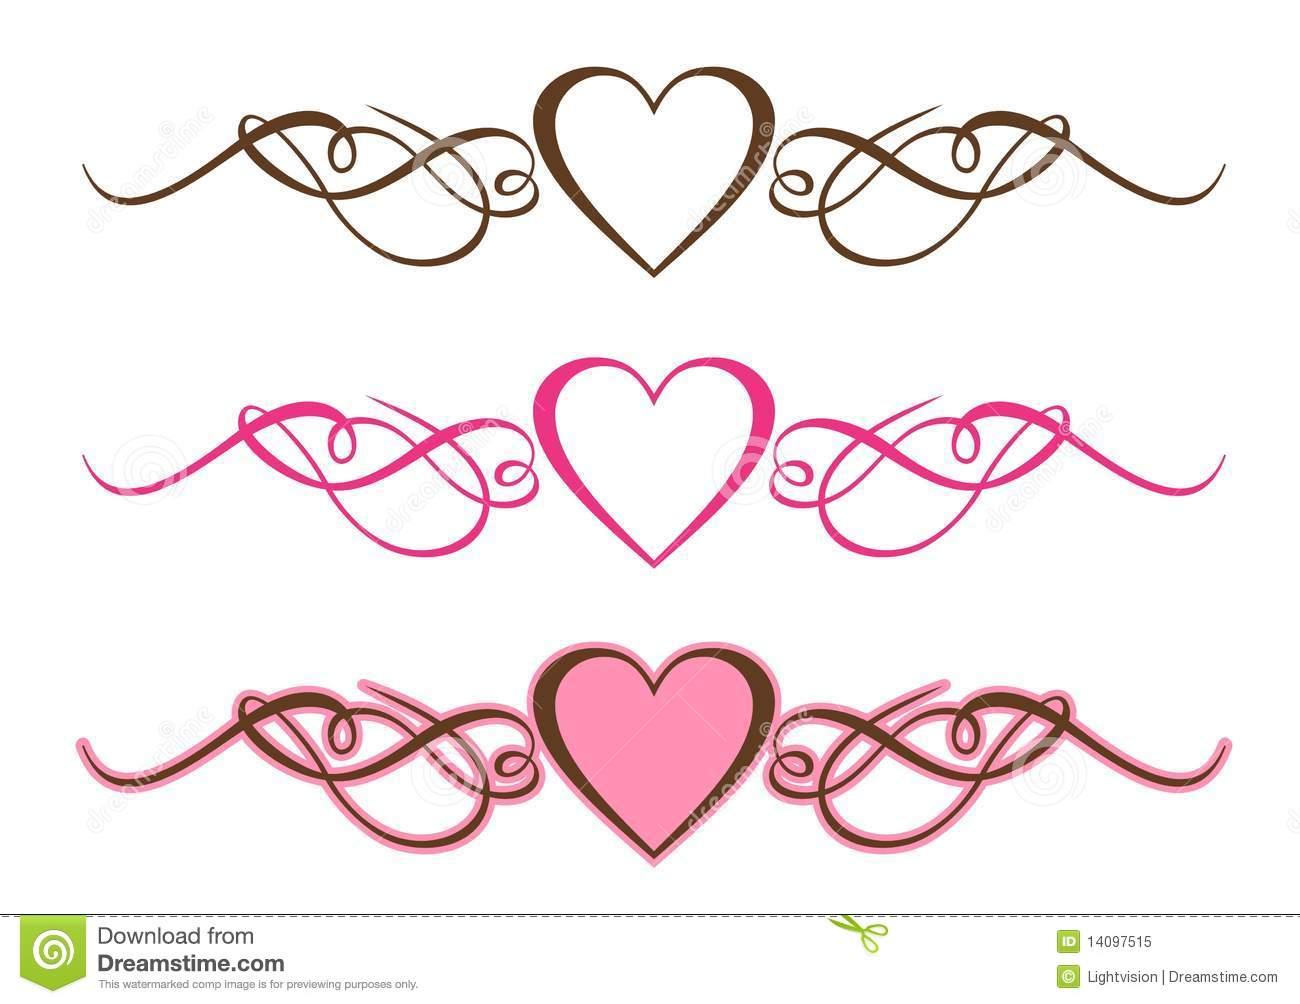 Wedding scroll heart clipart banner royalty free Free Scrollwork Heart Cliparts, Download Free Clip Art, Free ... banner royalty free